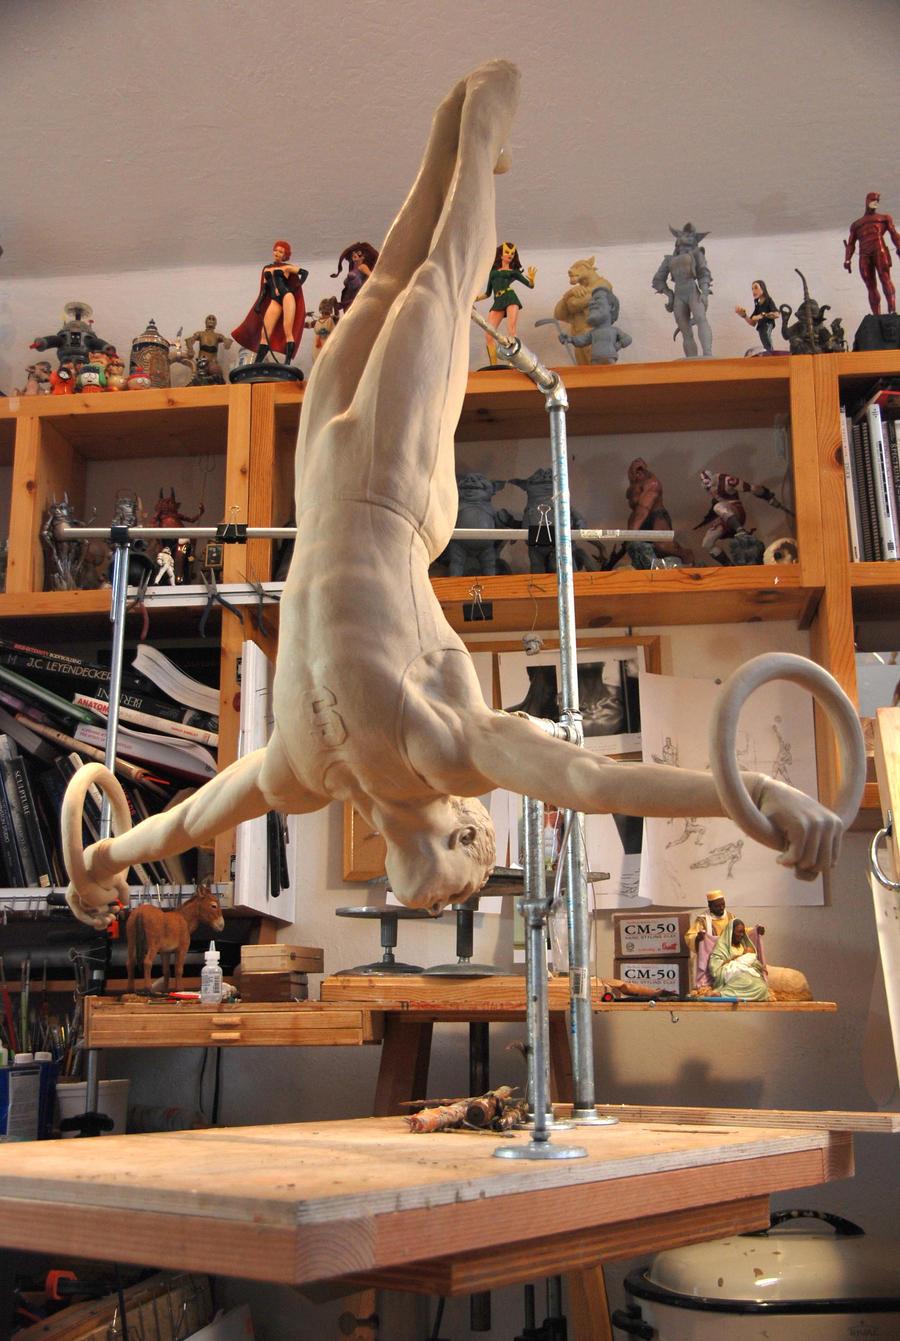 Gymnast almost fin 2